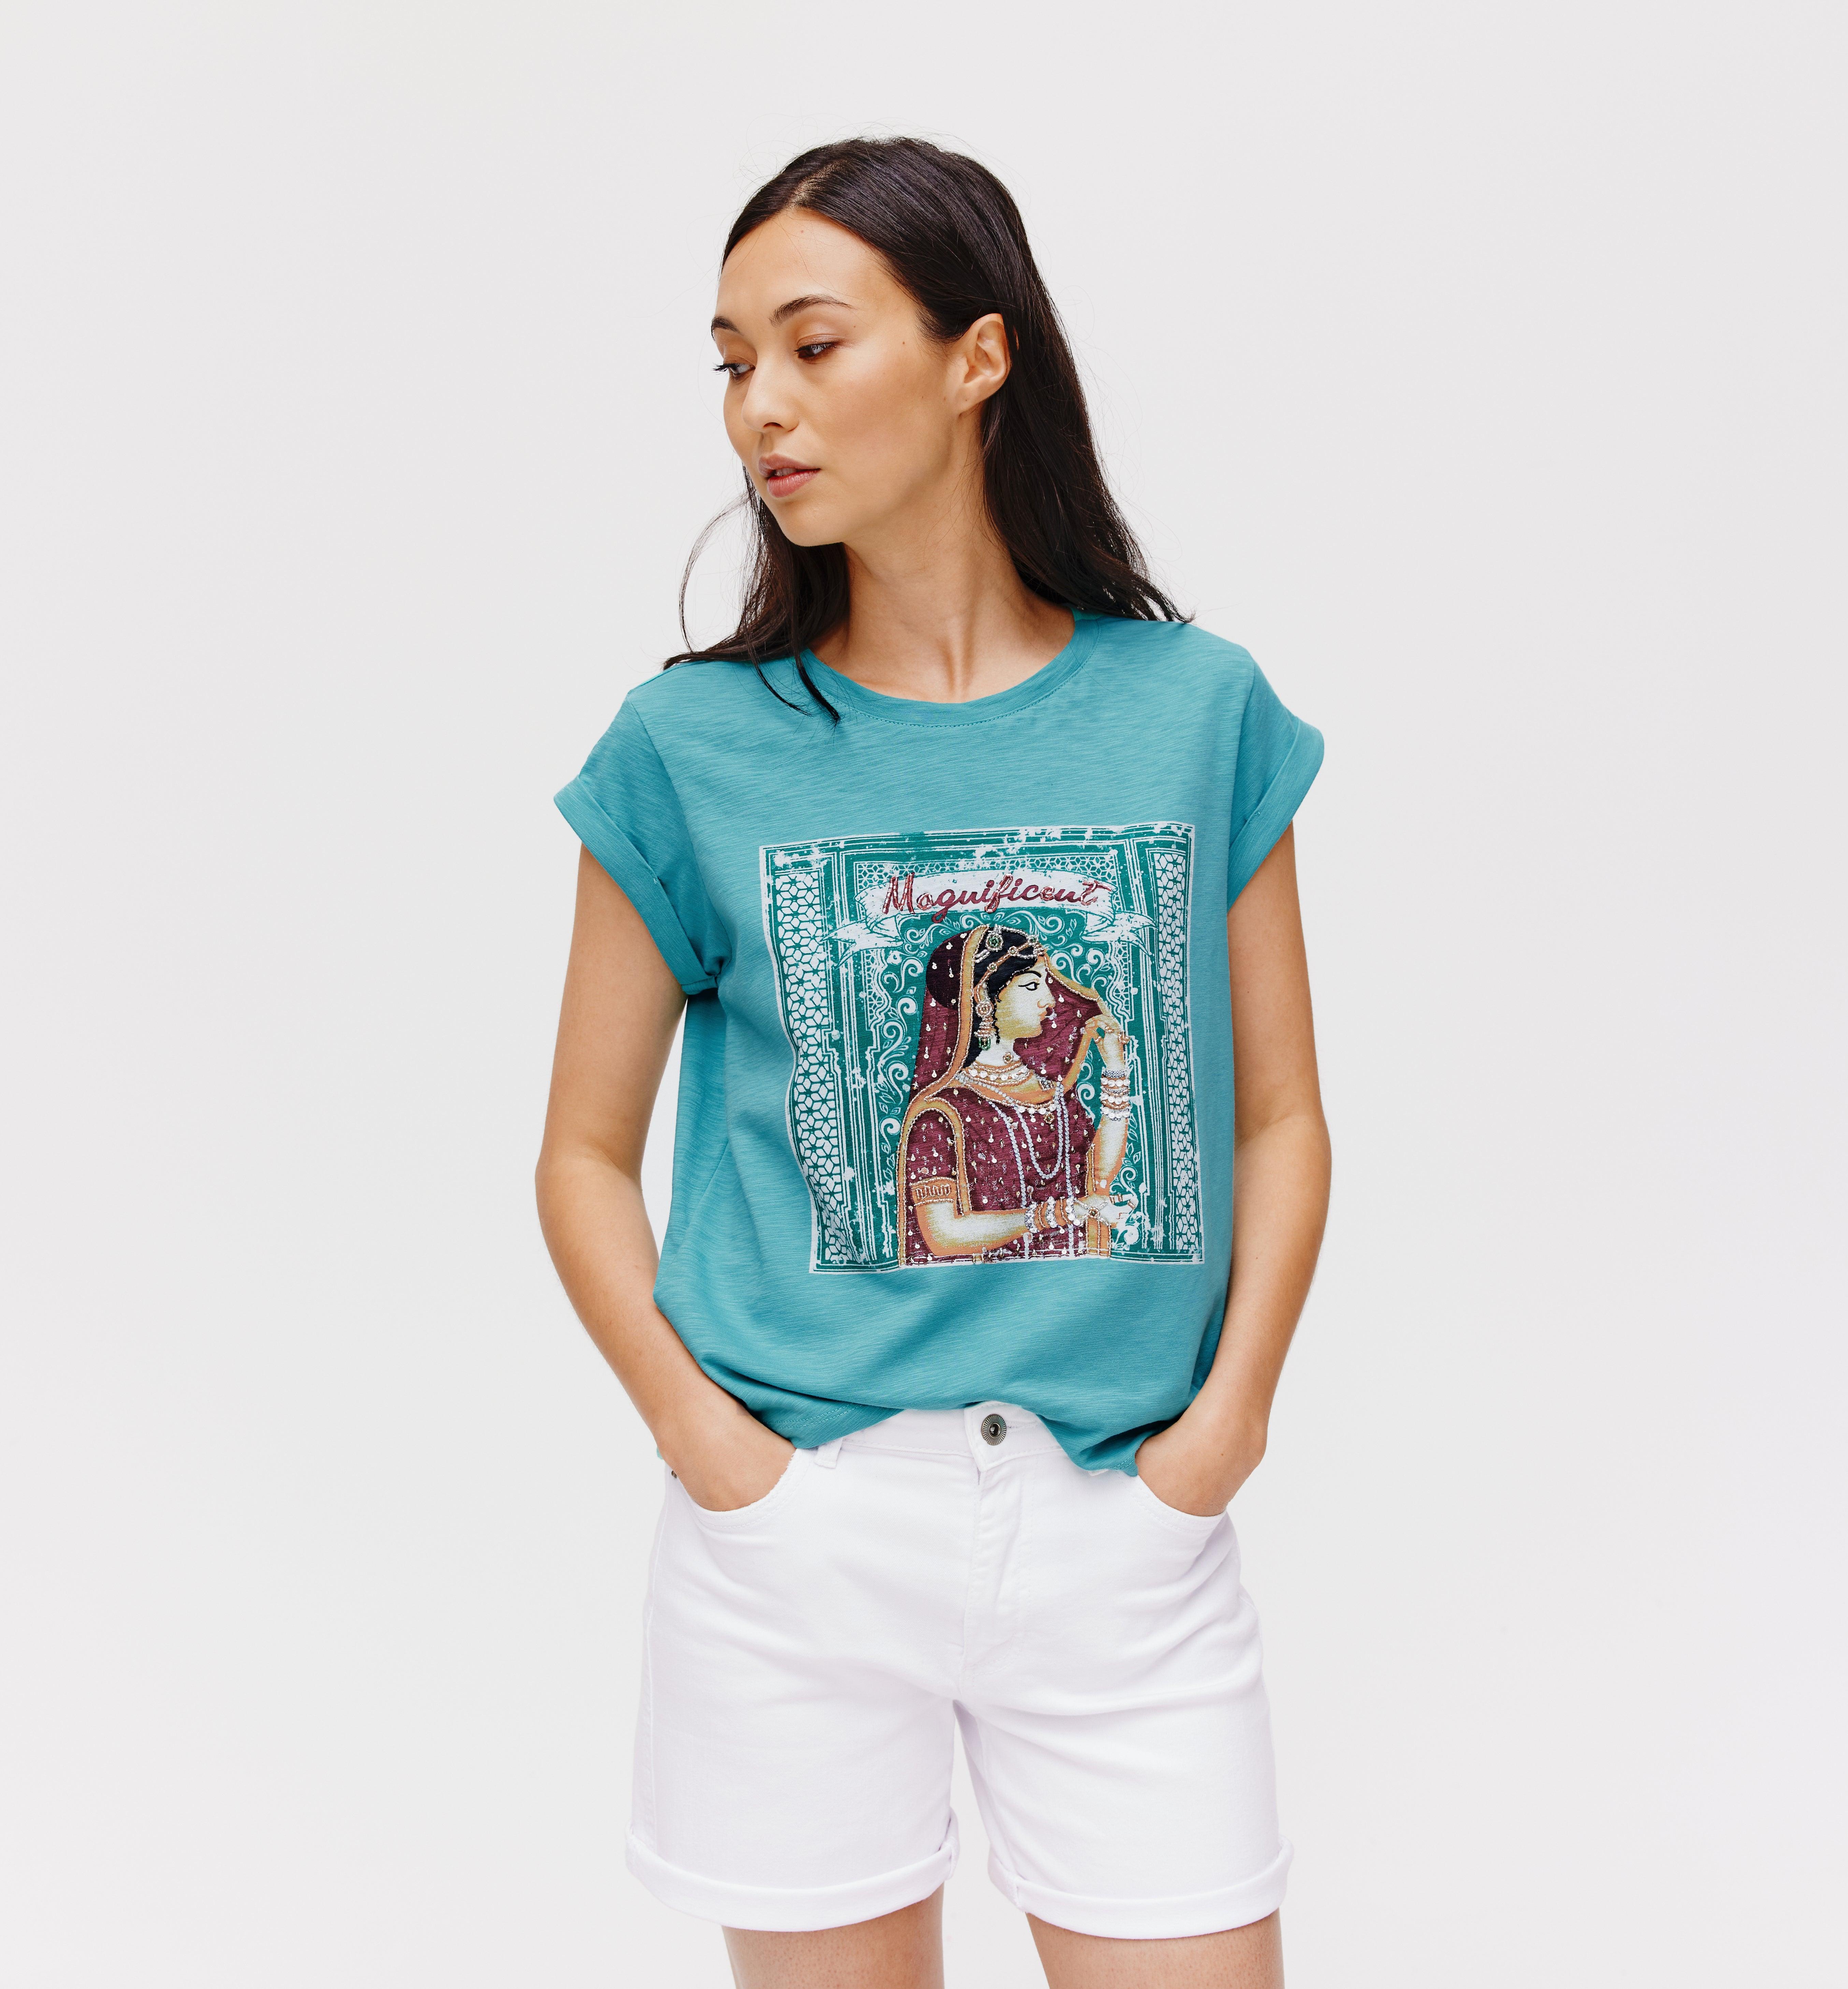 T-shirt perlé en Inde Femme